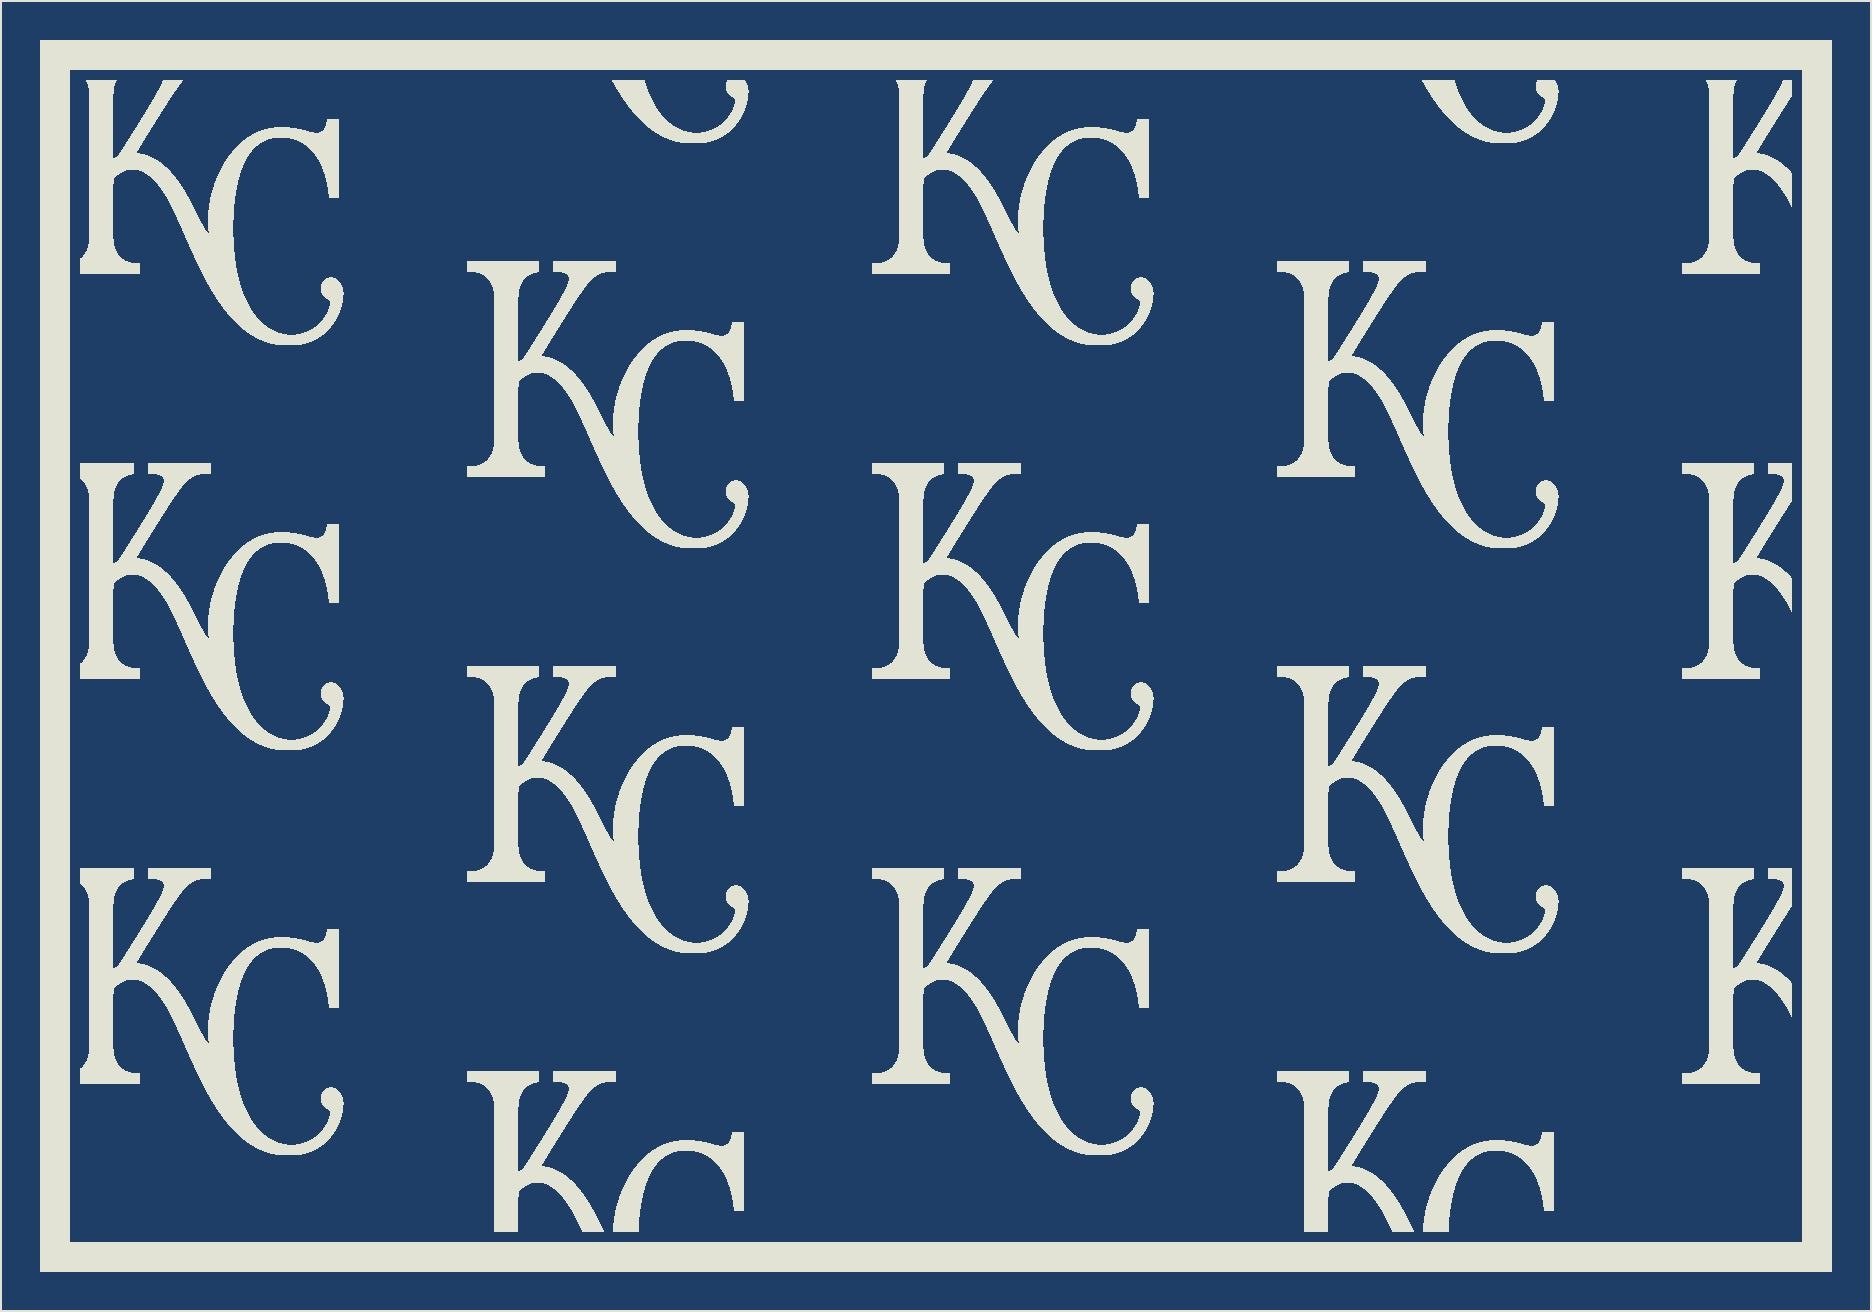 kansas city royals mlb baseball 11 wallpaper background by wallpaperup 1872x1312